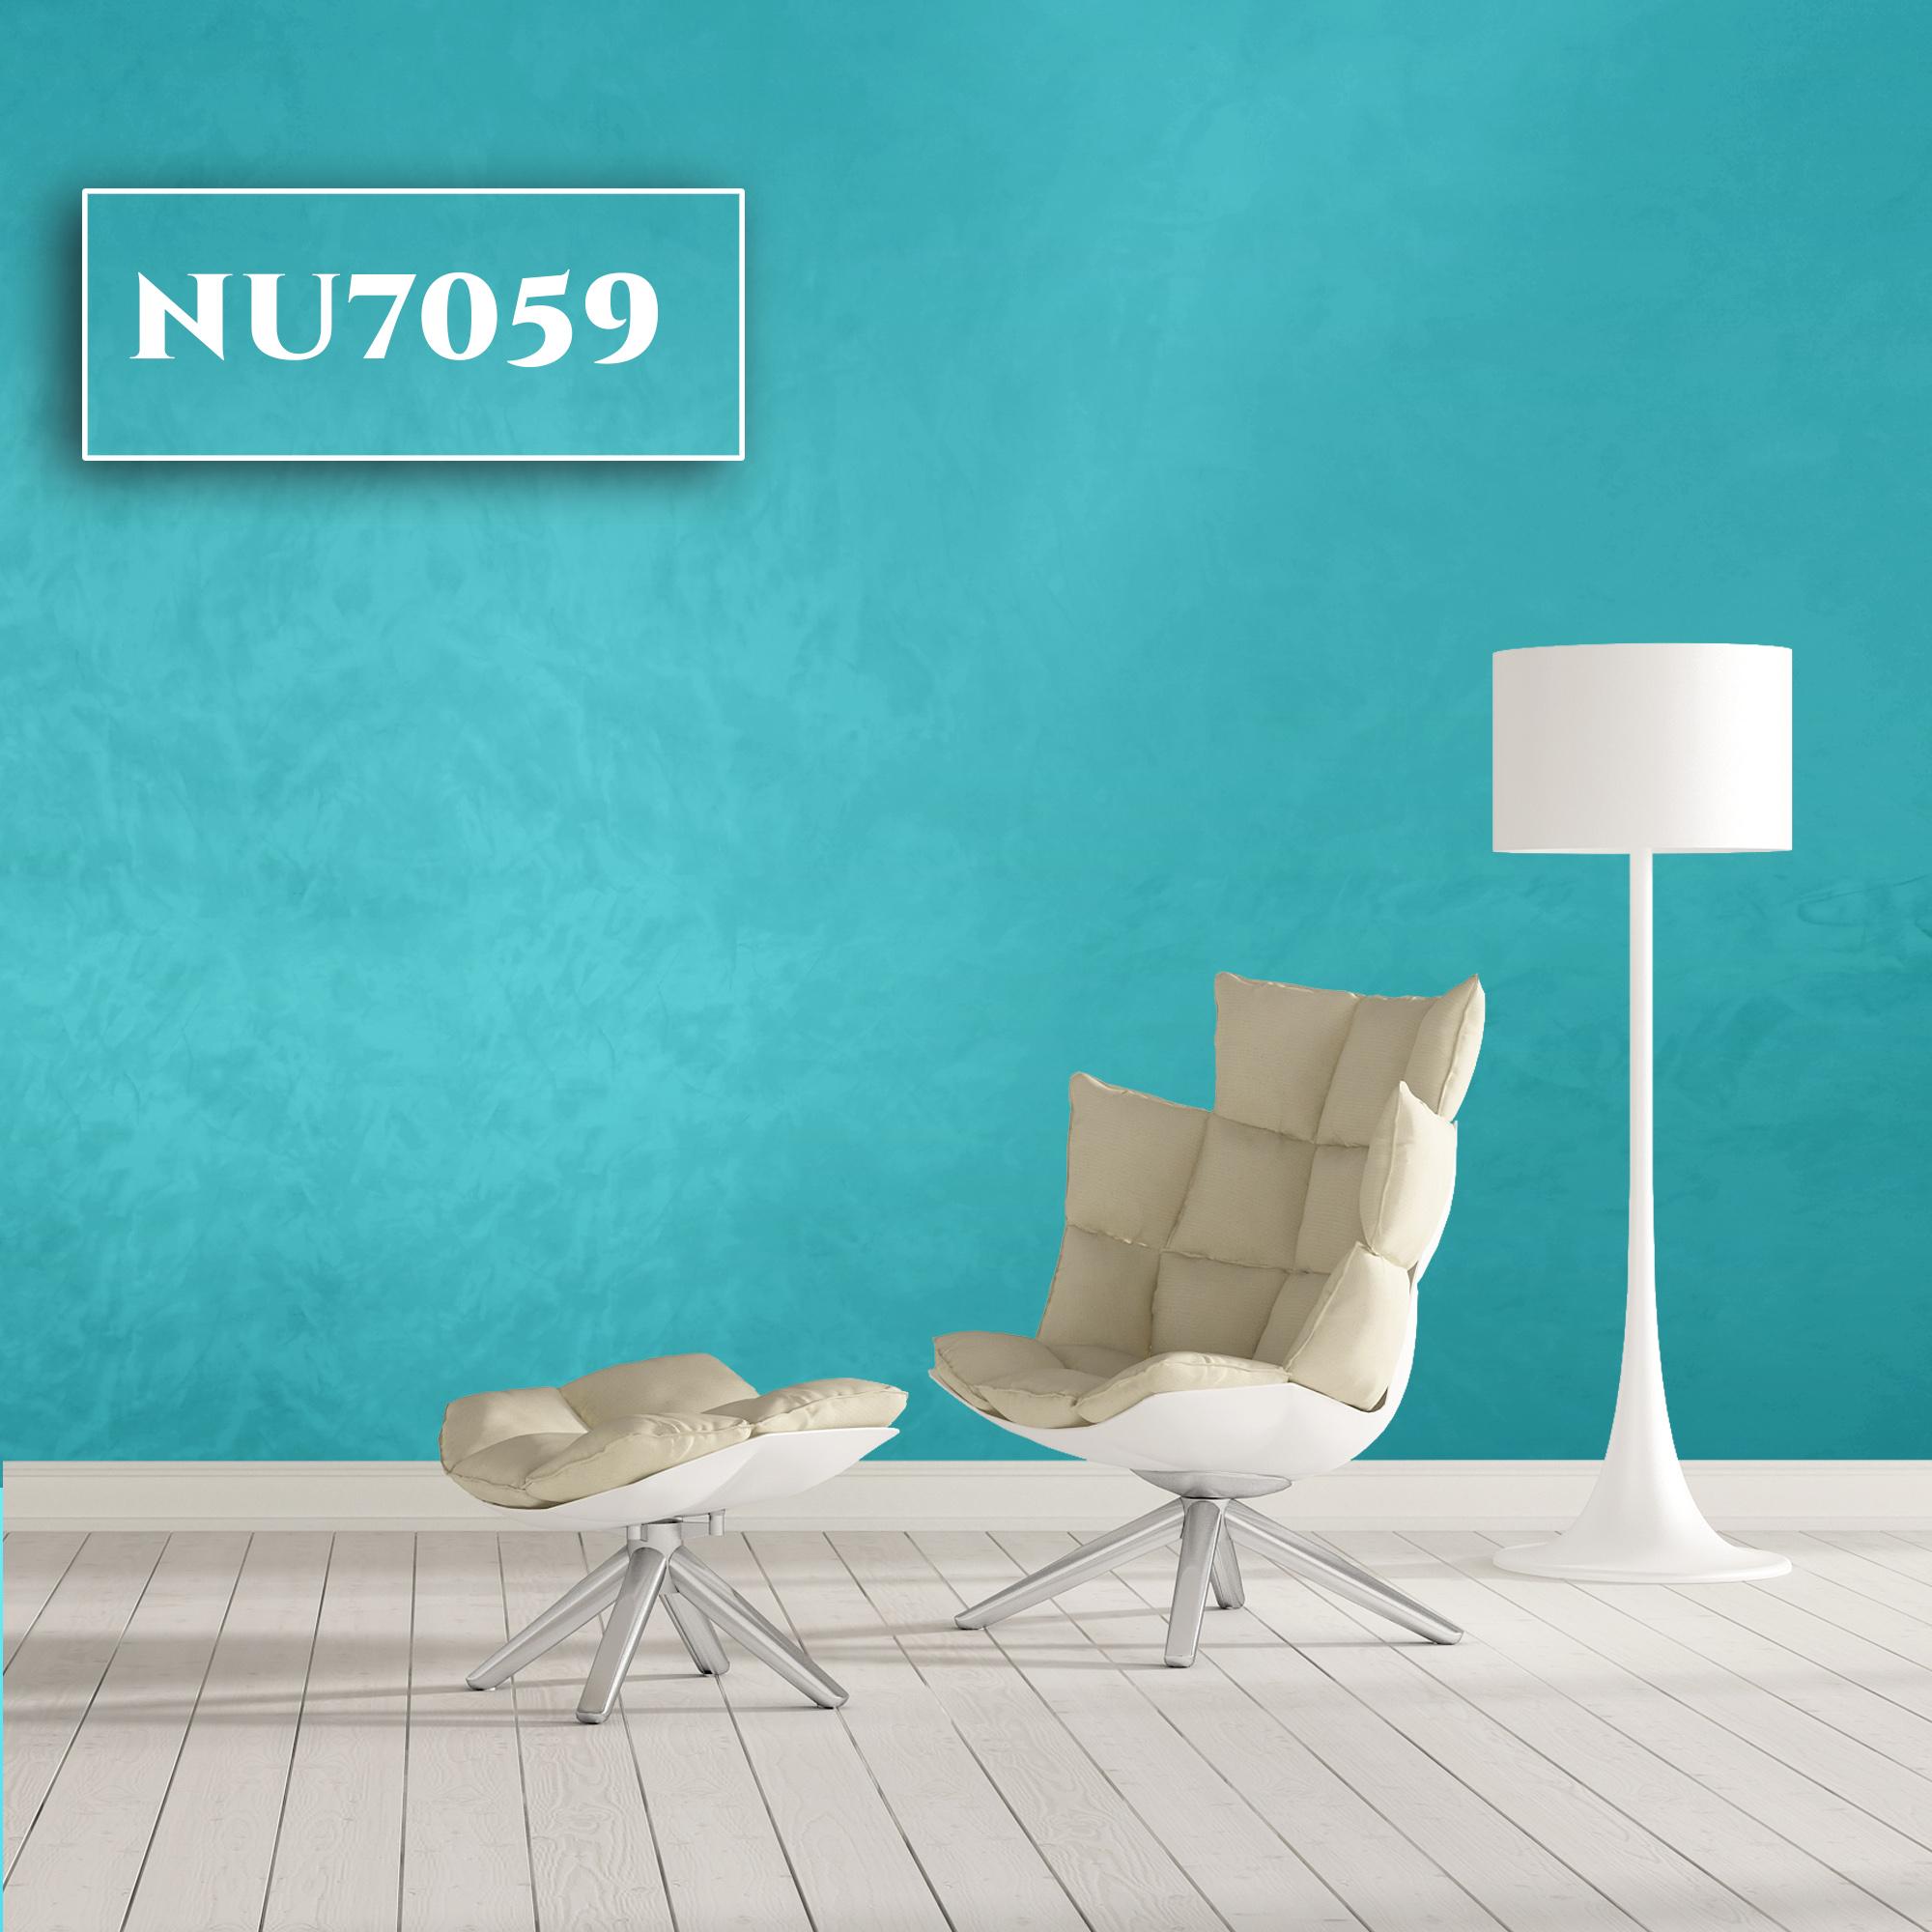 NU7059